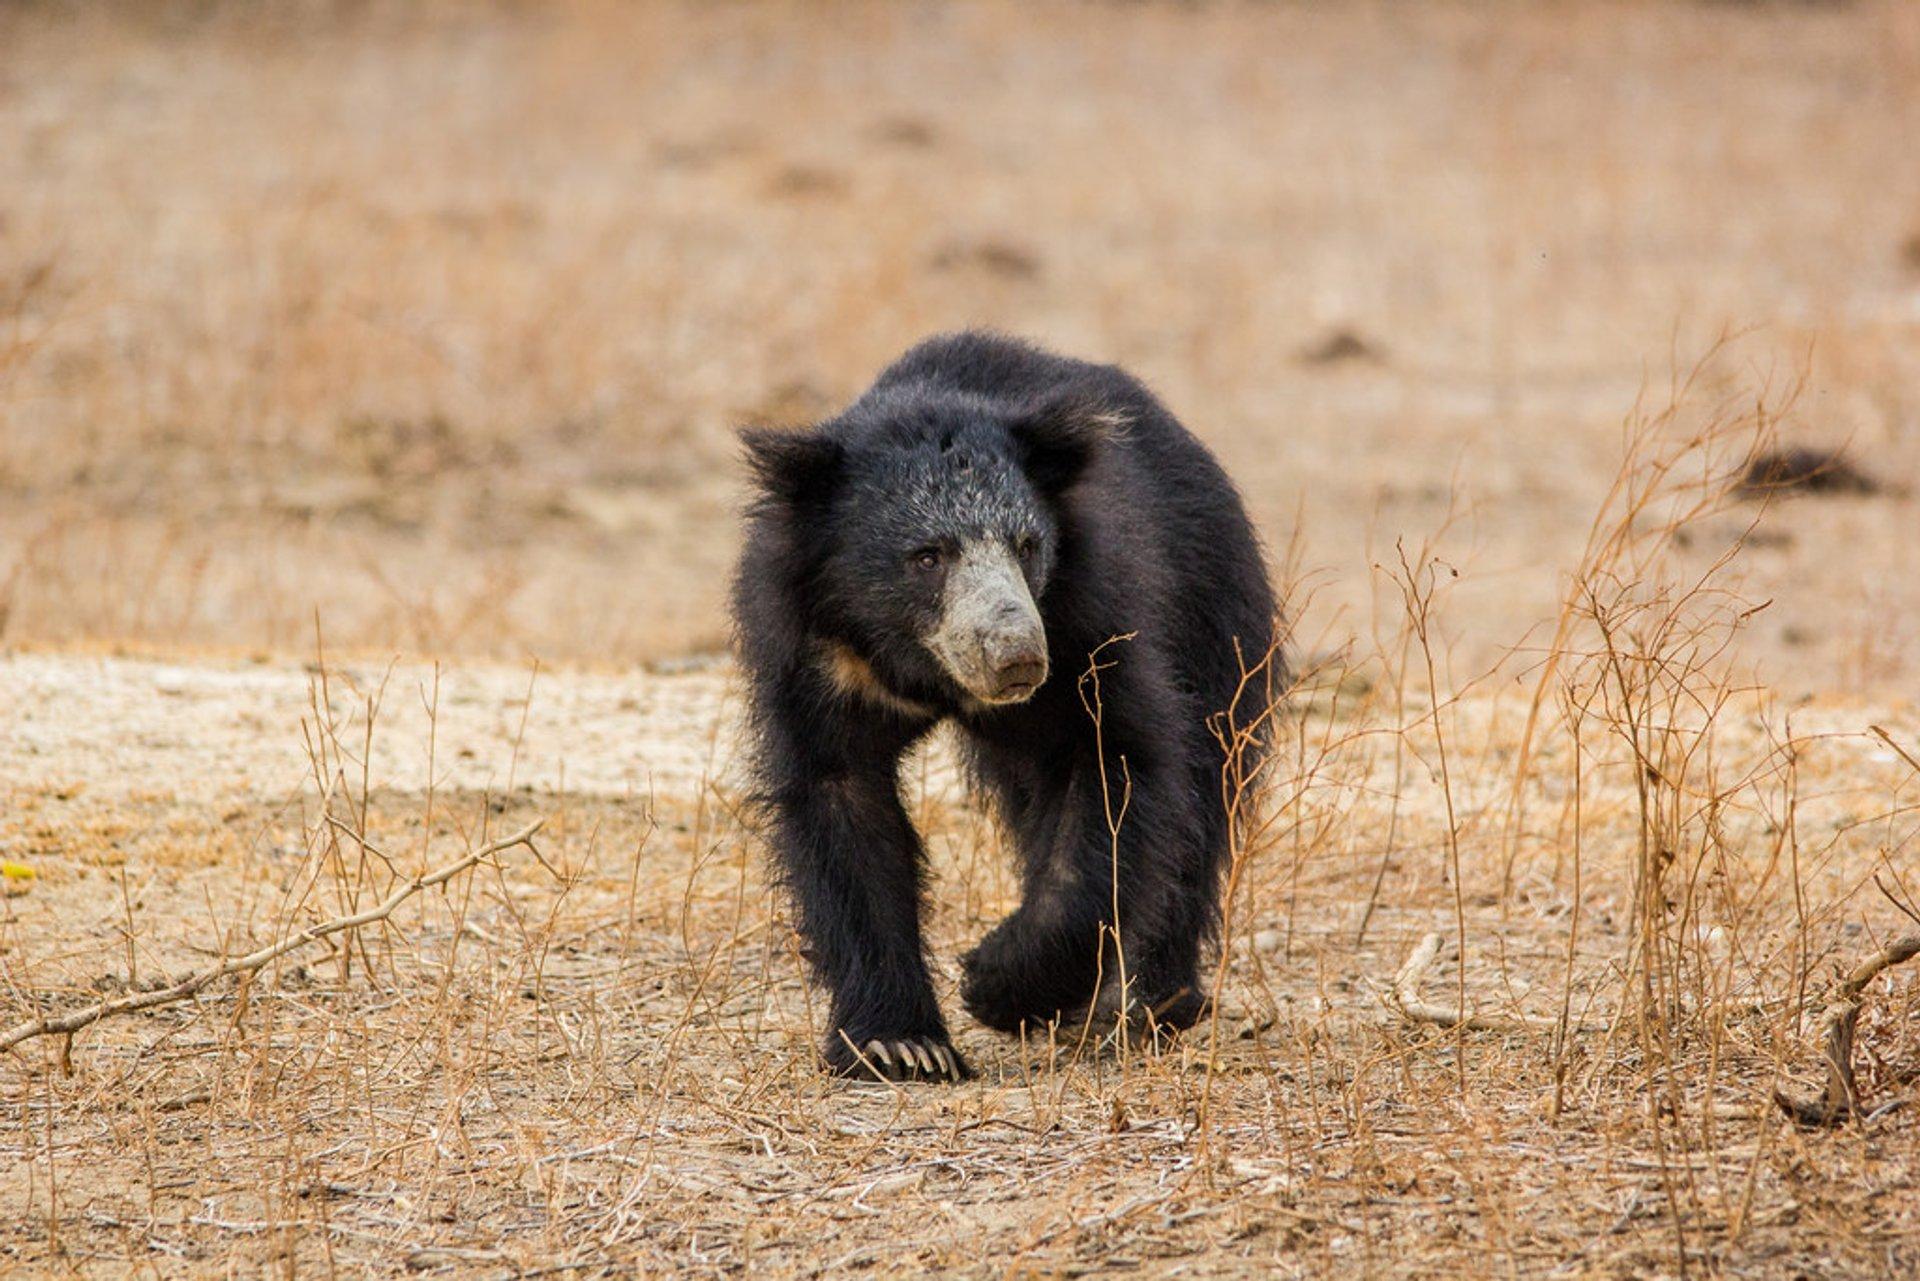 Sloth Bear in Sri Lanka 2020 - Best Time